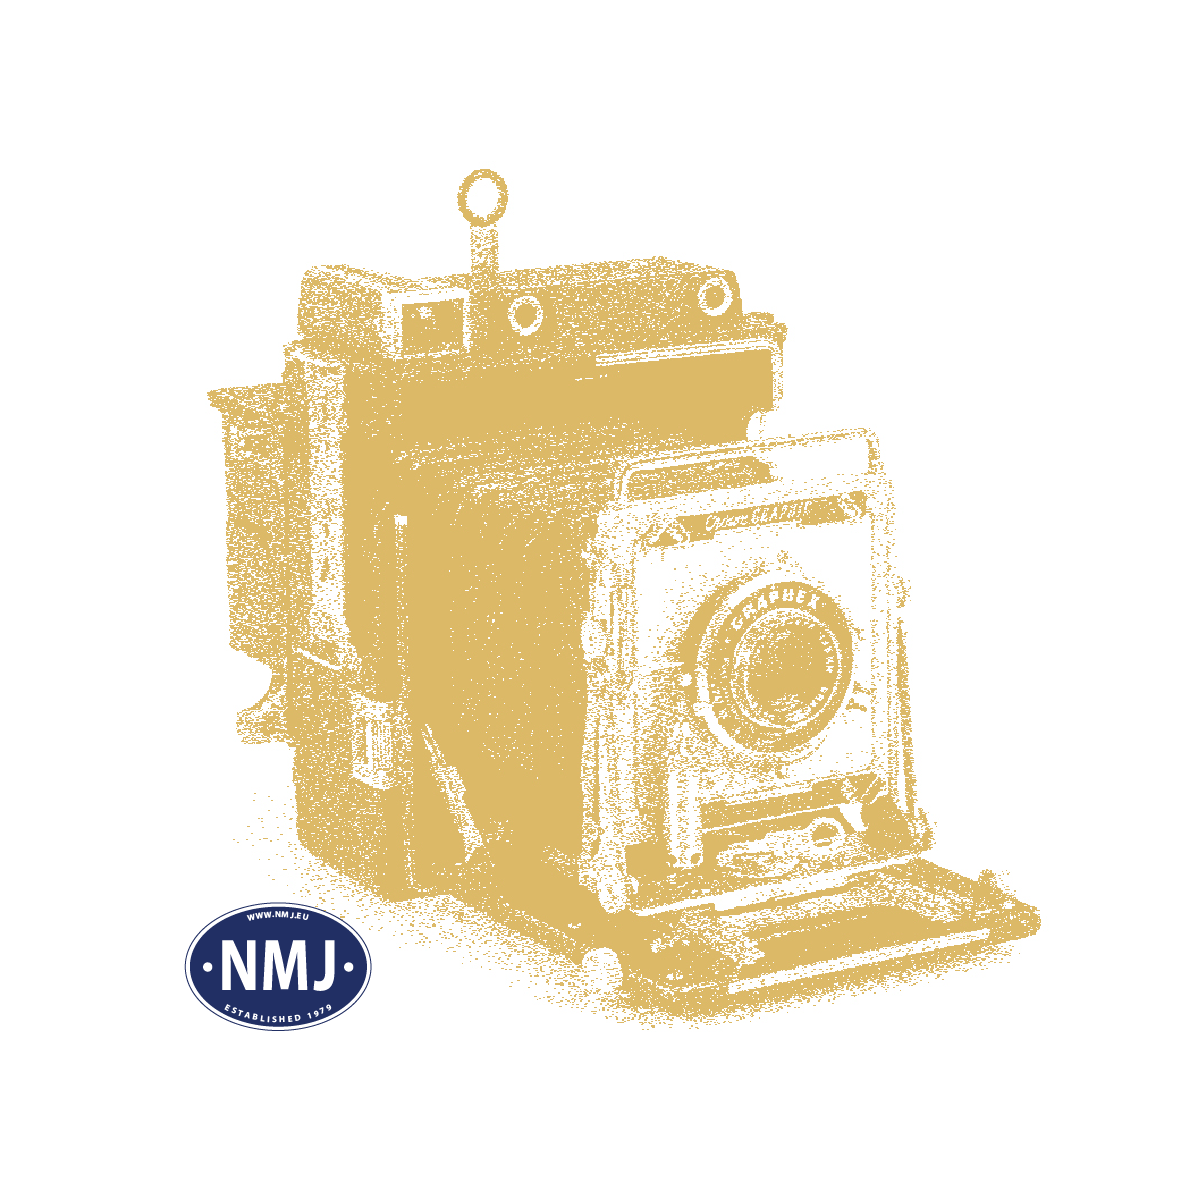 NOC08212 - Strøgress, 1,5mm, Gressgrønn